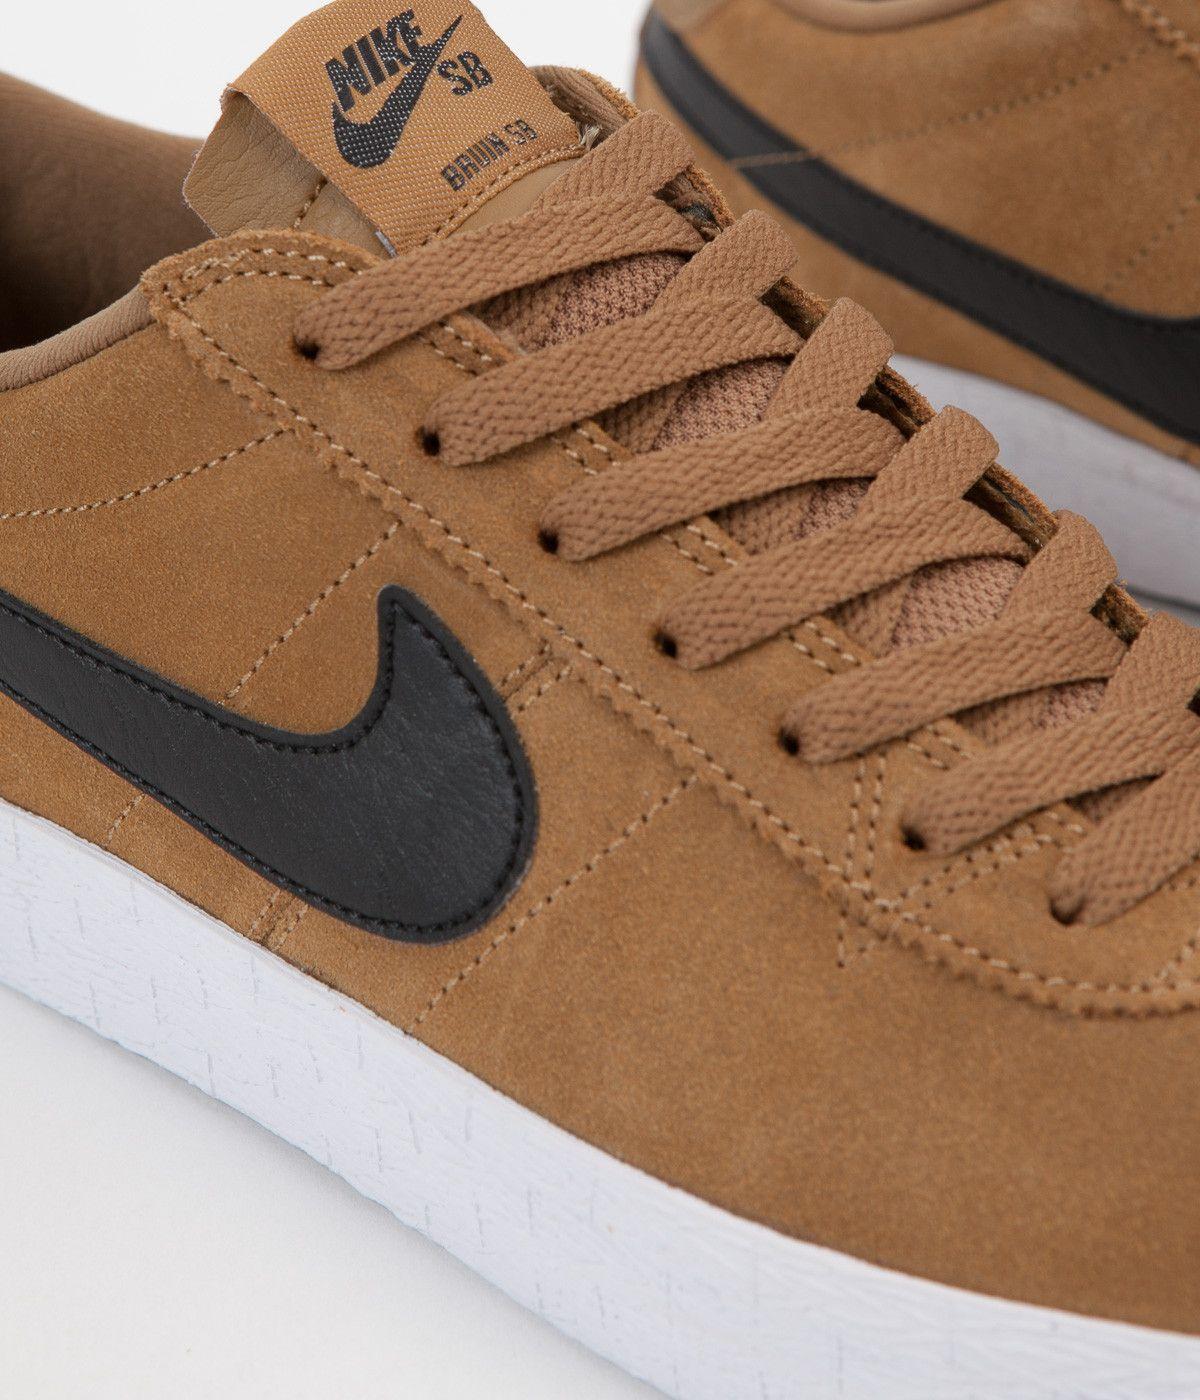 c944d90f4594 ... Nike SB Bruin Premium SE Shoes - Golden Beige Black - White - Black ...